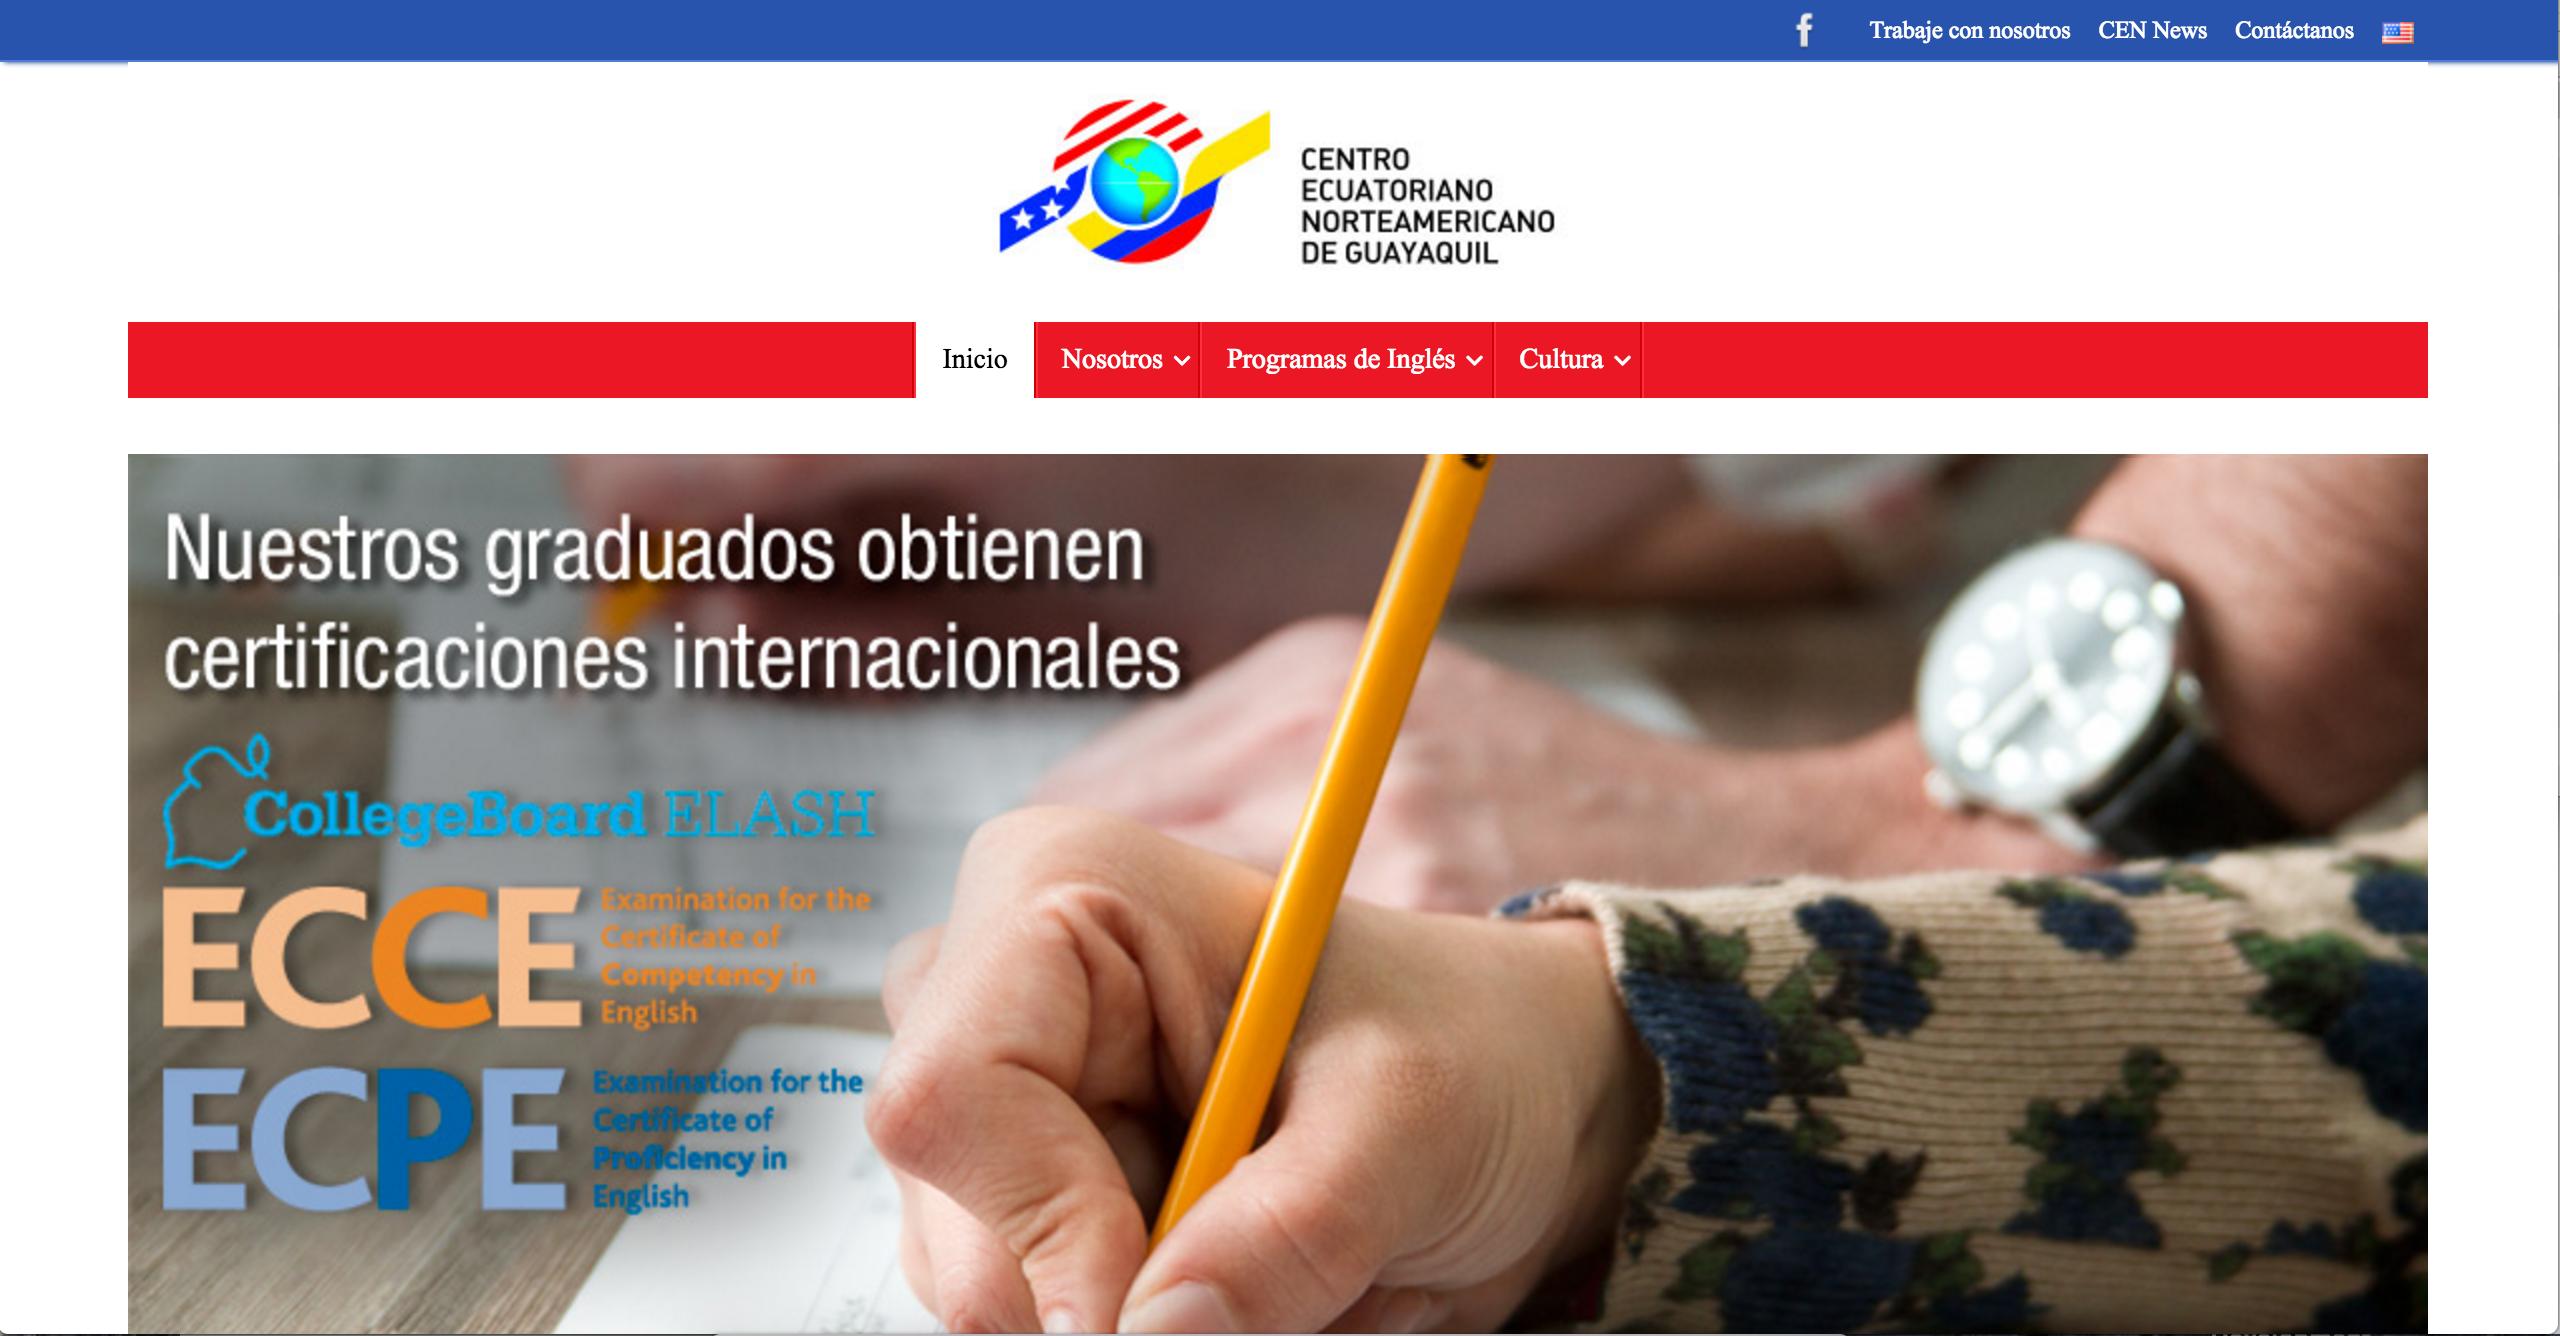 Centro Ecuatoriano Norteamericano de Guayaquil